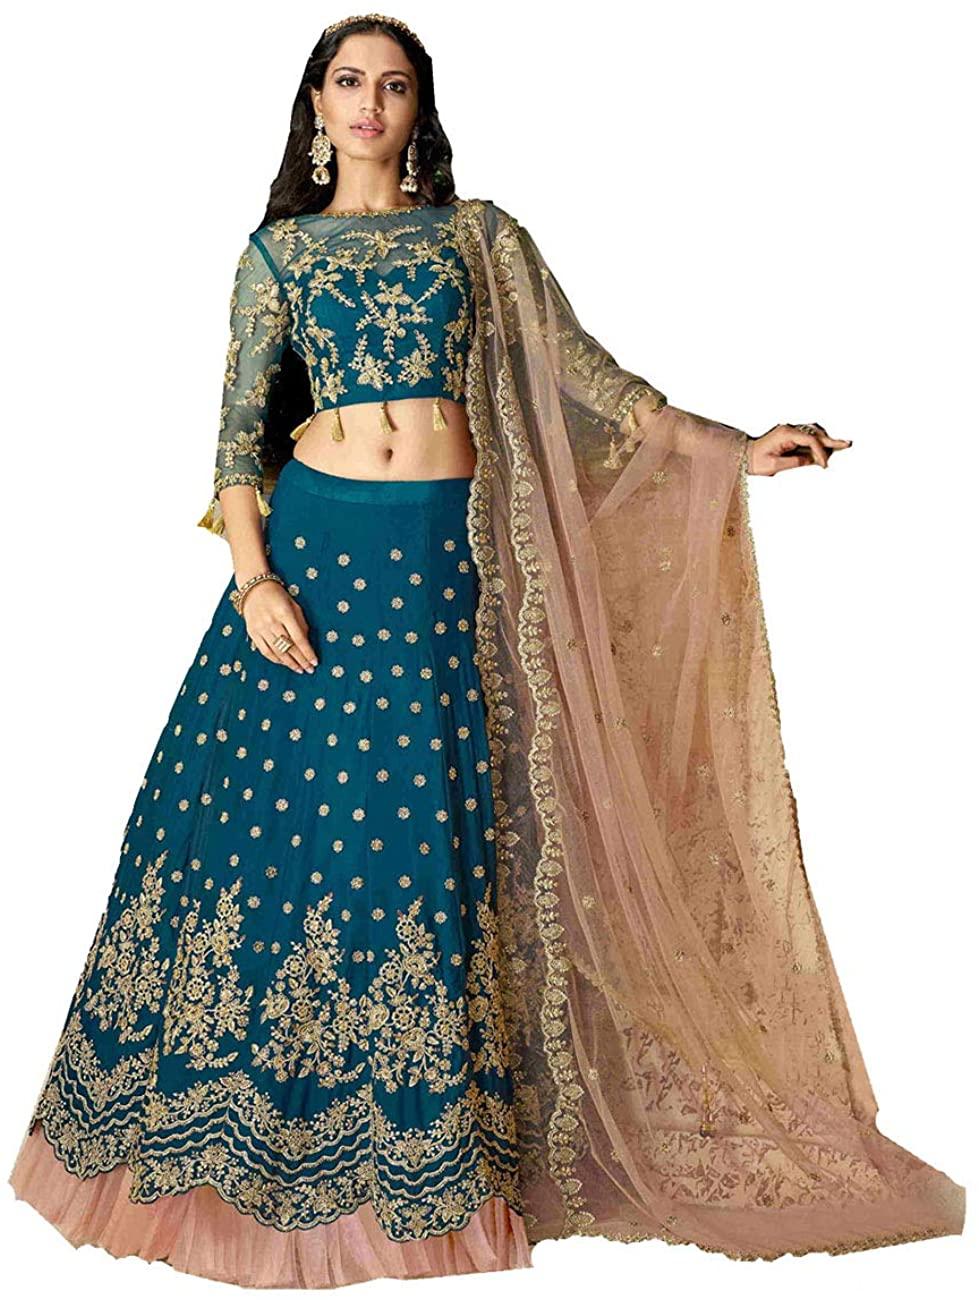 Indian Women Designer Partywear Ethnic Traditional Blue Lehenga Choli. ICW2607-11